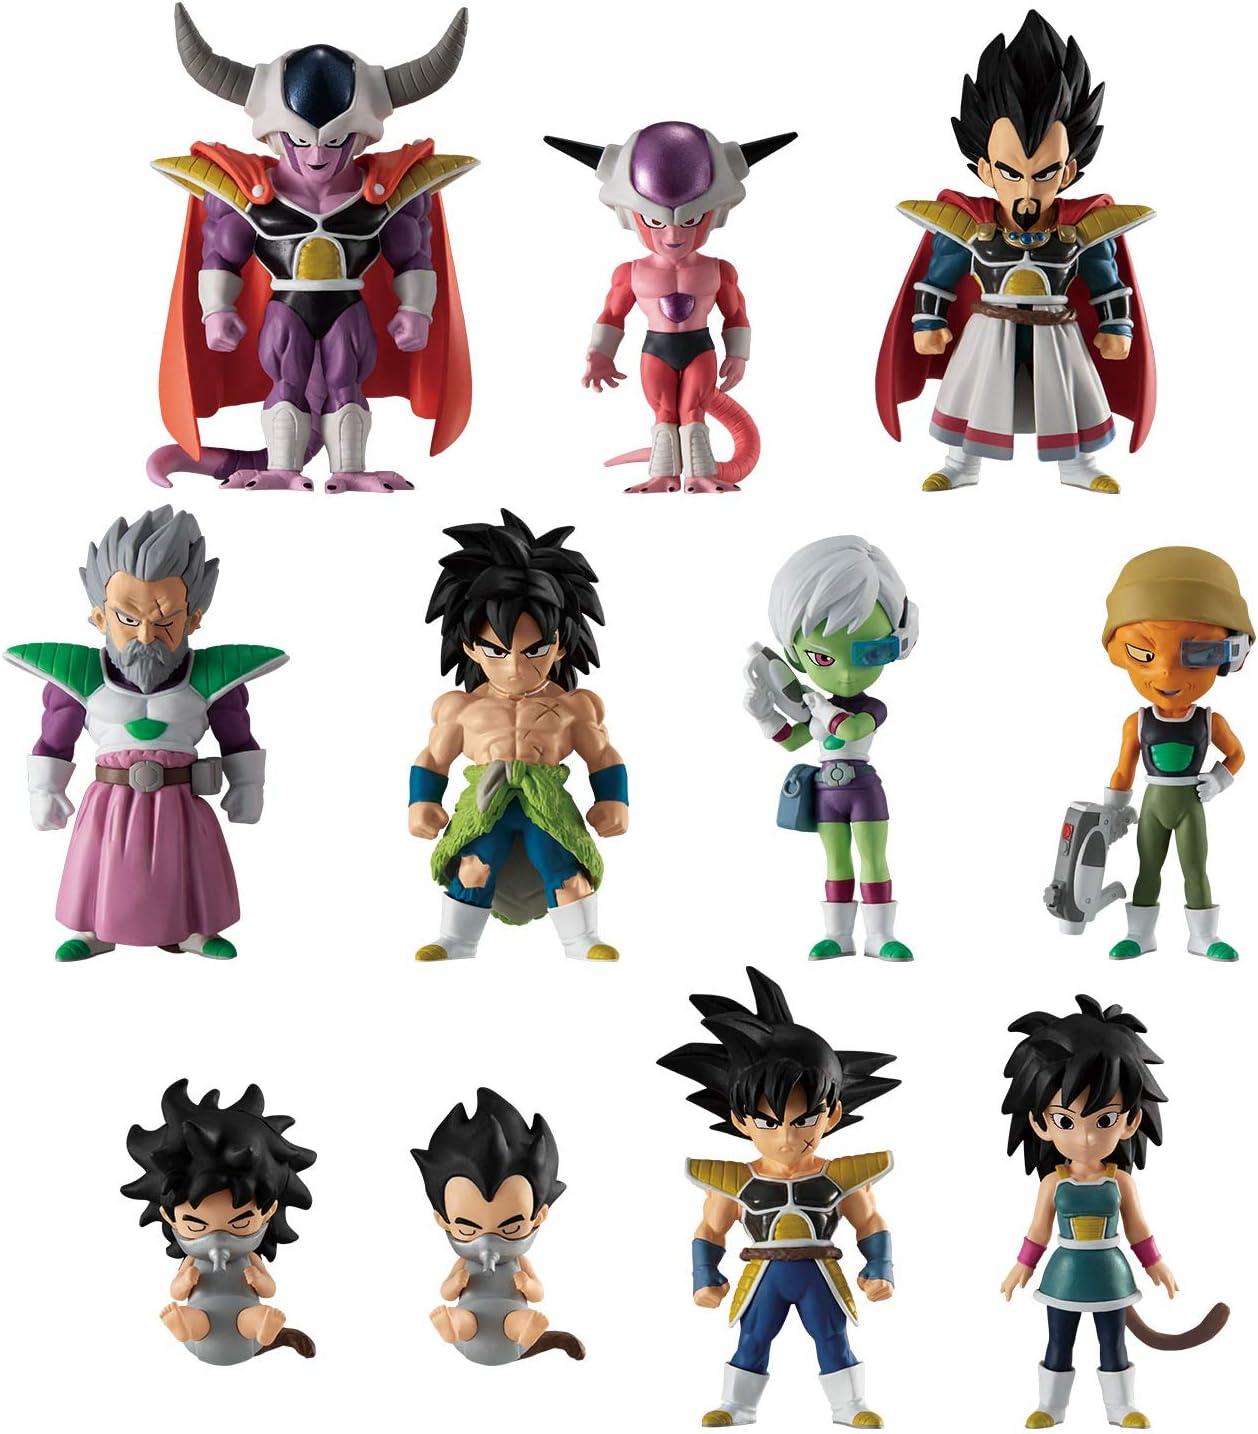 Shokugan Dragon Ball Adverge 9 Movie Special Action Figure Broly Super Saiyan